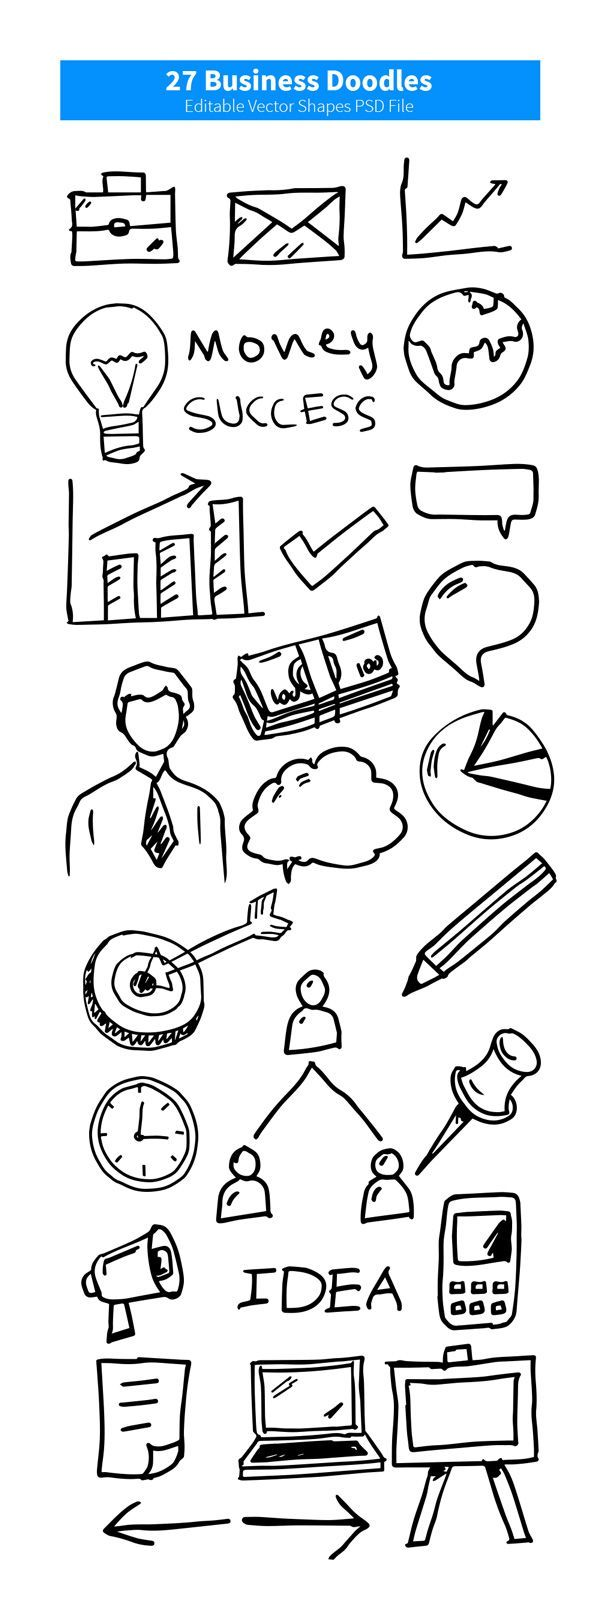 27 Business Doodles PSD